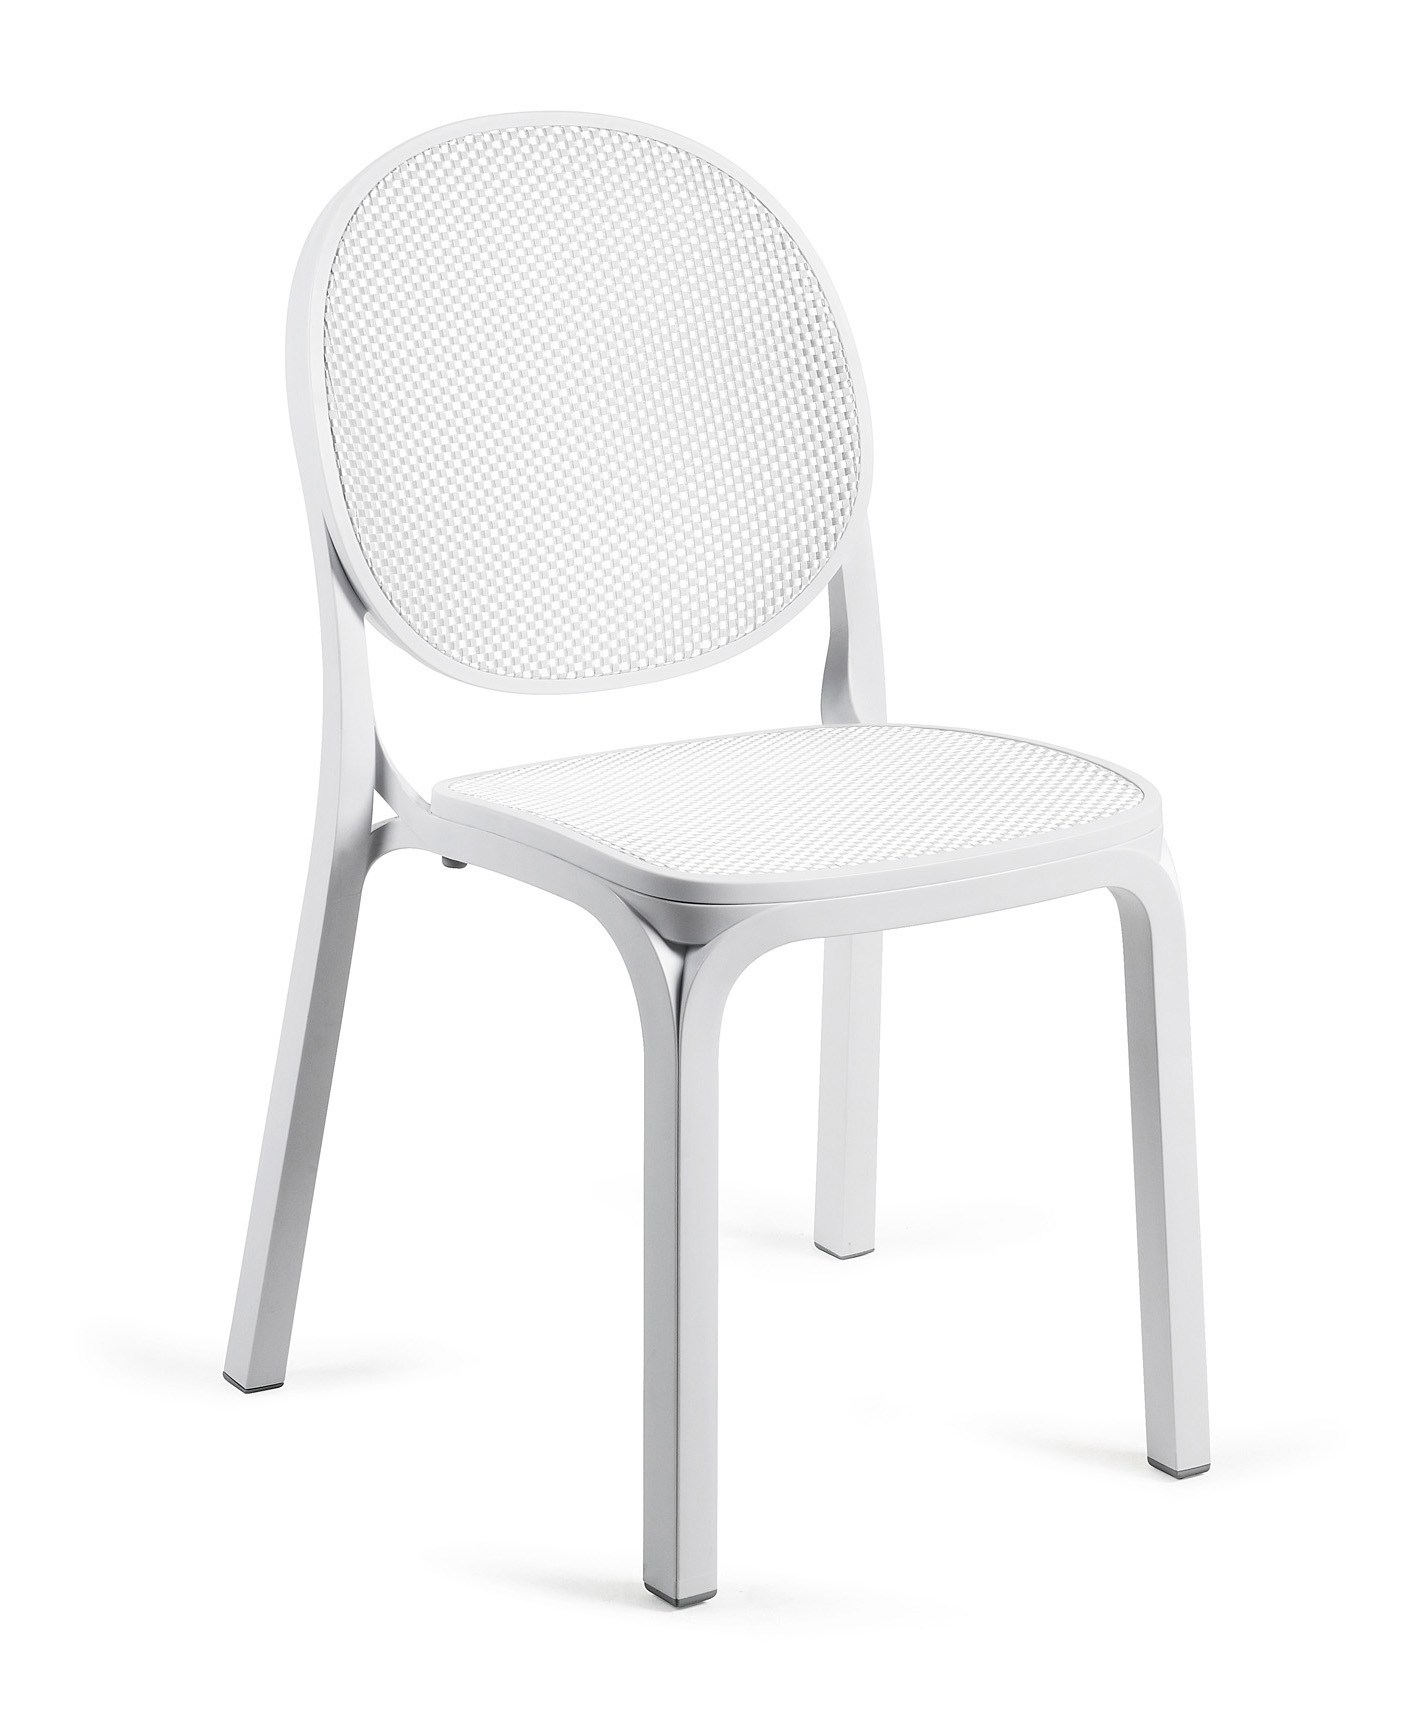 chaise de jardin empilable fresia by nardi design. Black Bedroom Furniture Sets. Home Design Ideas